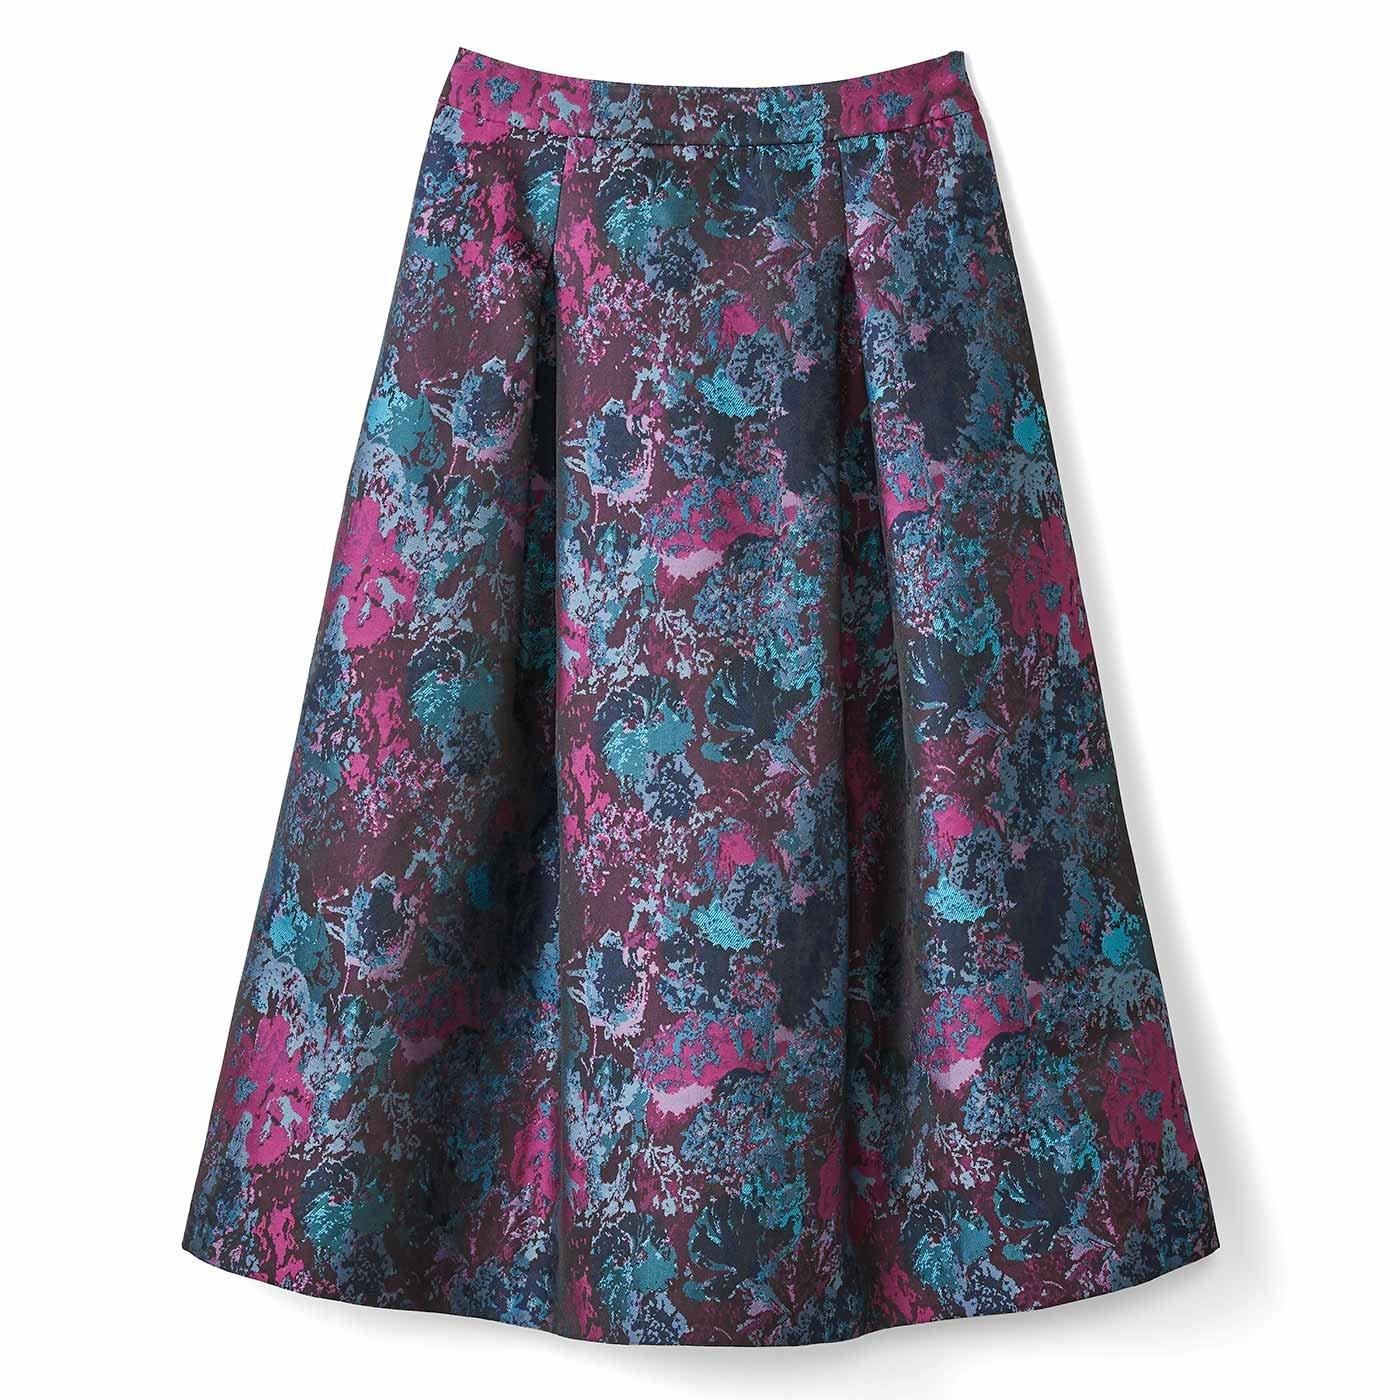 IEDIT[イディット] ふんわりシルエットの華やぎタックジャカードスカート〈ブルー〉